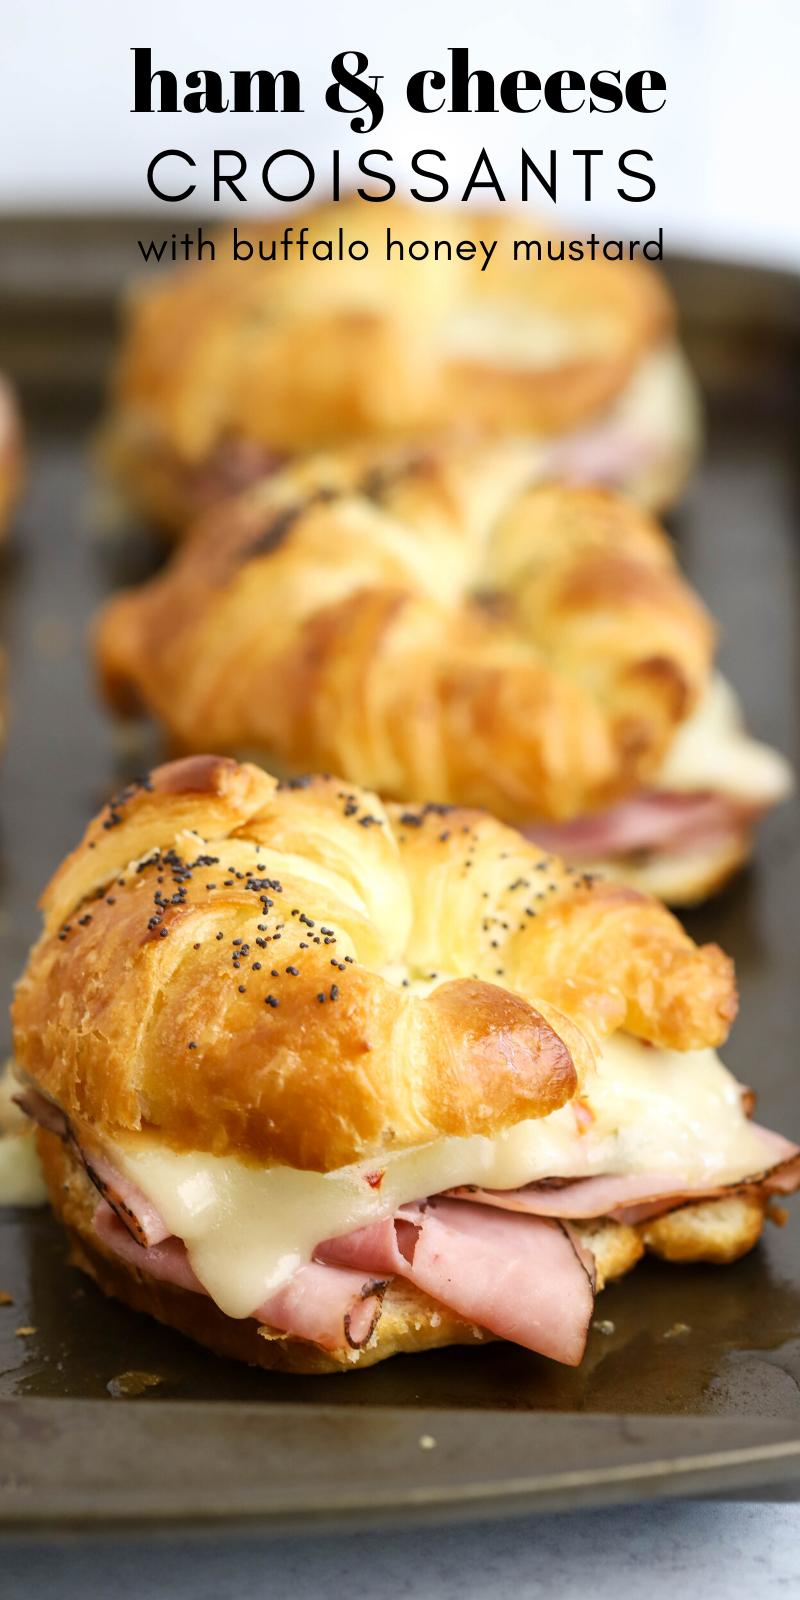 Spicy Buffalo Honey Mustard Ham and Cheese Croissant   Simply Made Recipes